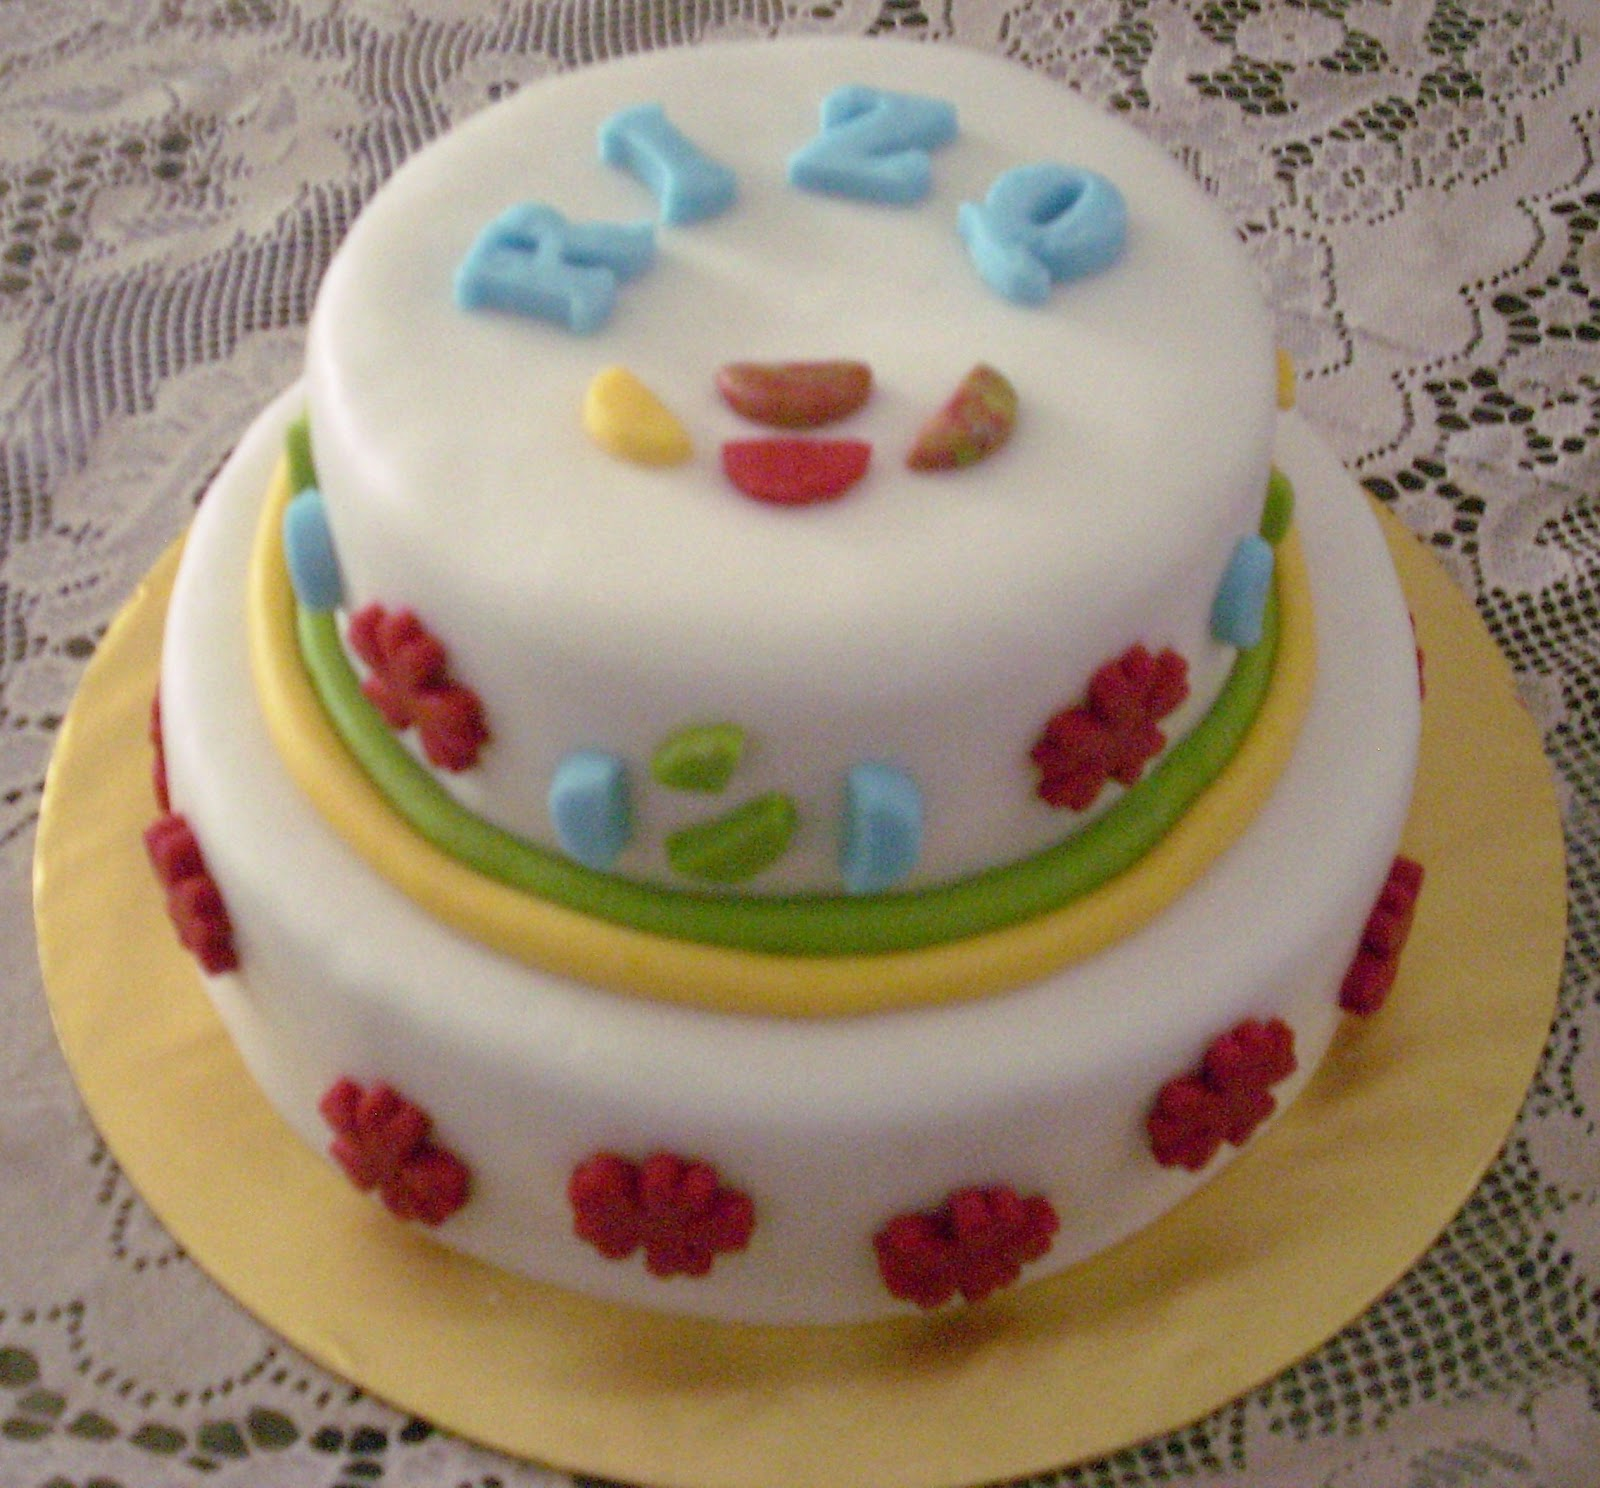 No. 11 - Rolled fondant cake 4.5 kg = RM180.00